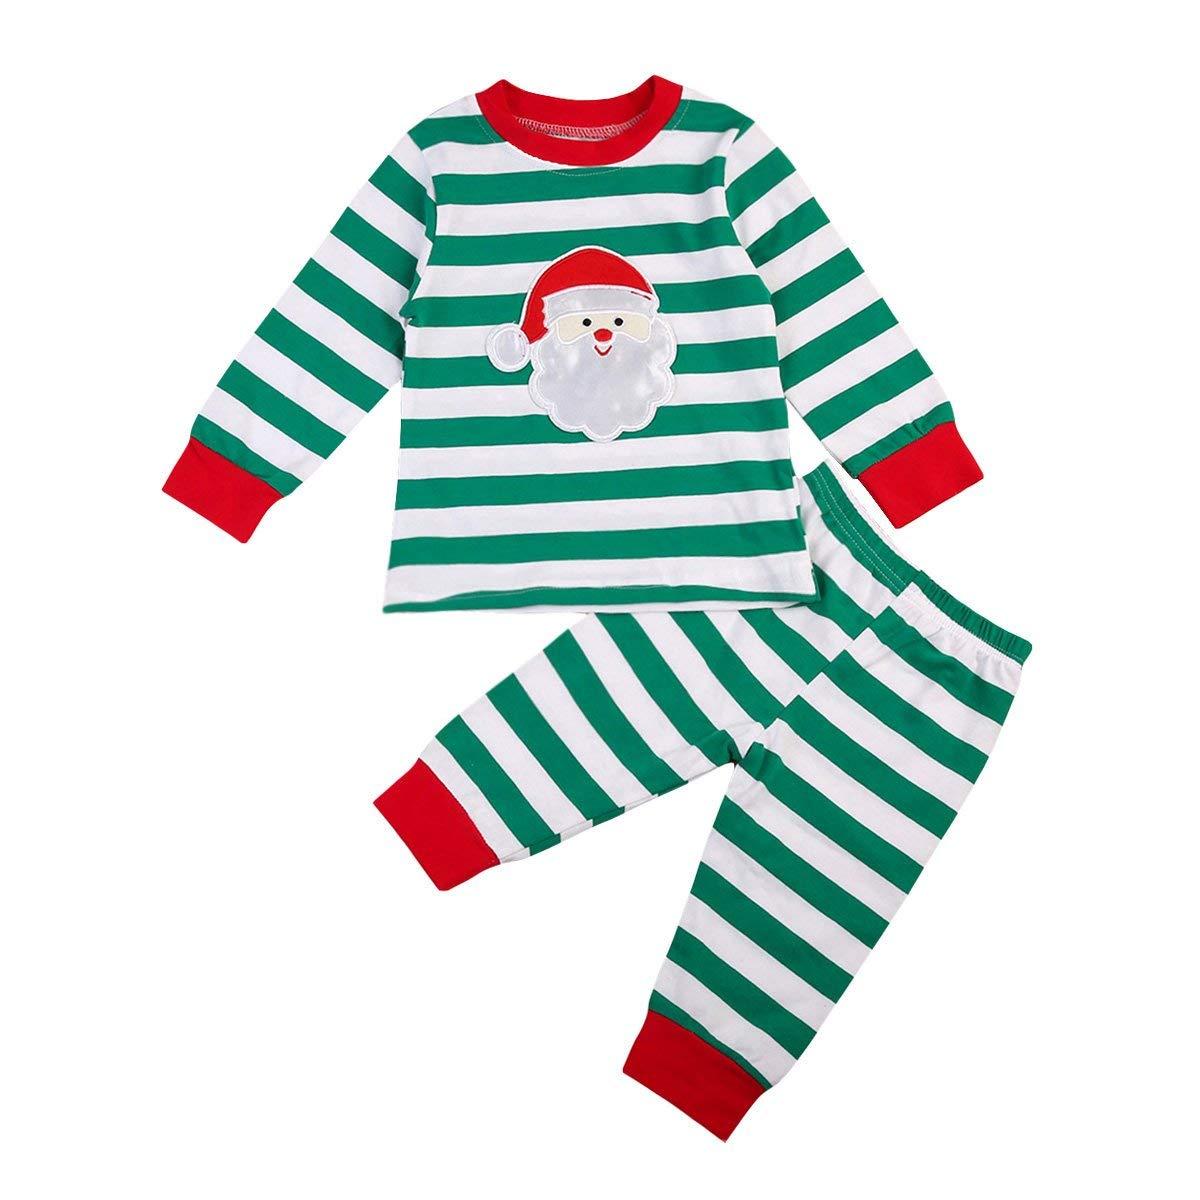 2f0845d365 Get Quotations · Newborn Baby Boy Stripe Pajamas Long Sleeve Tops Pants  Cute Christmas 2pcs Sleeper Wear Set